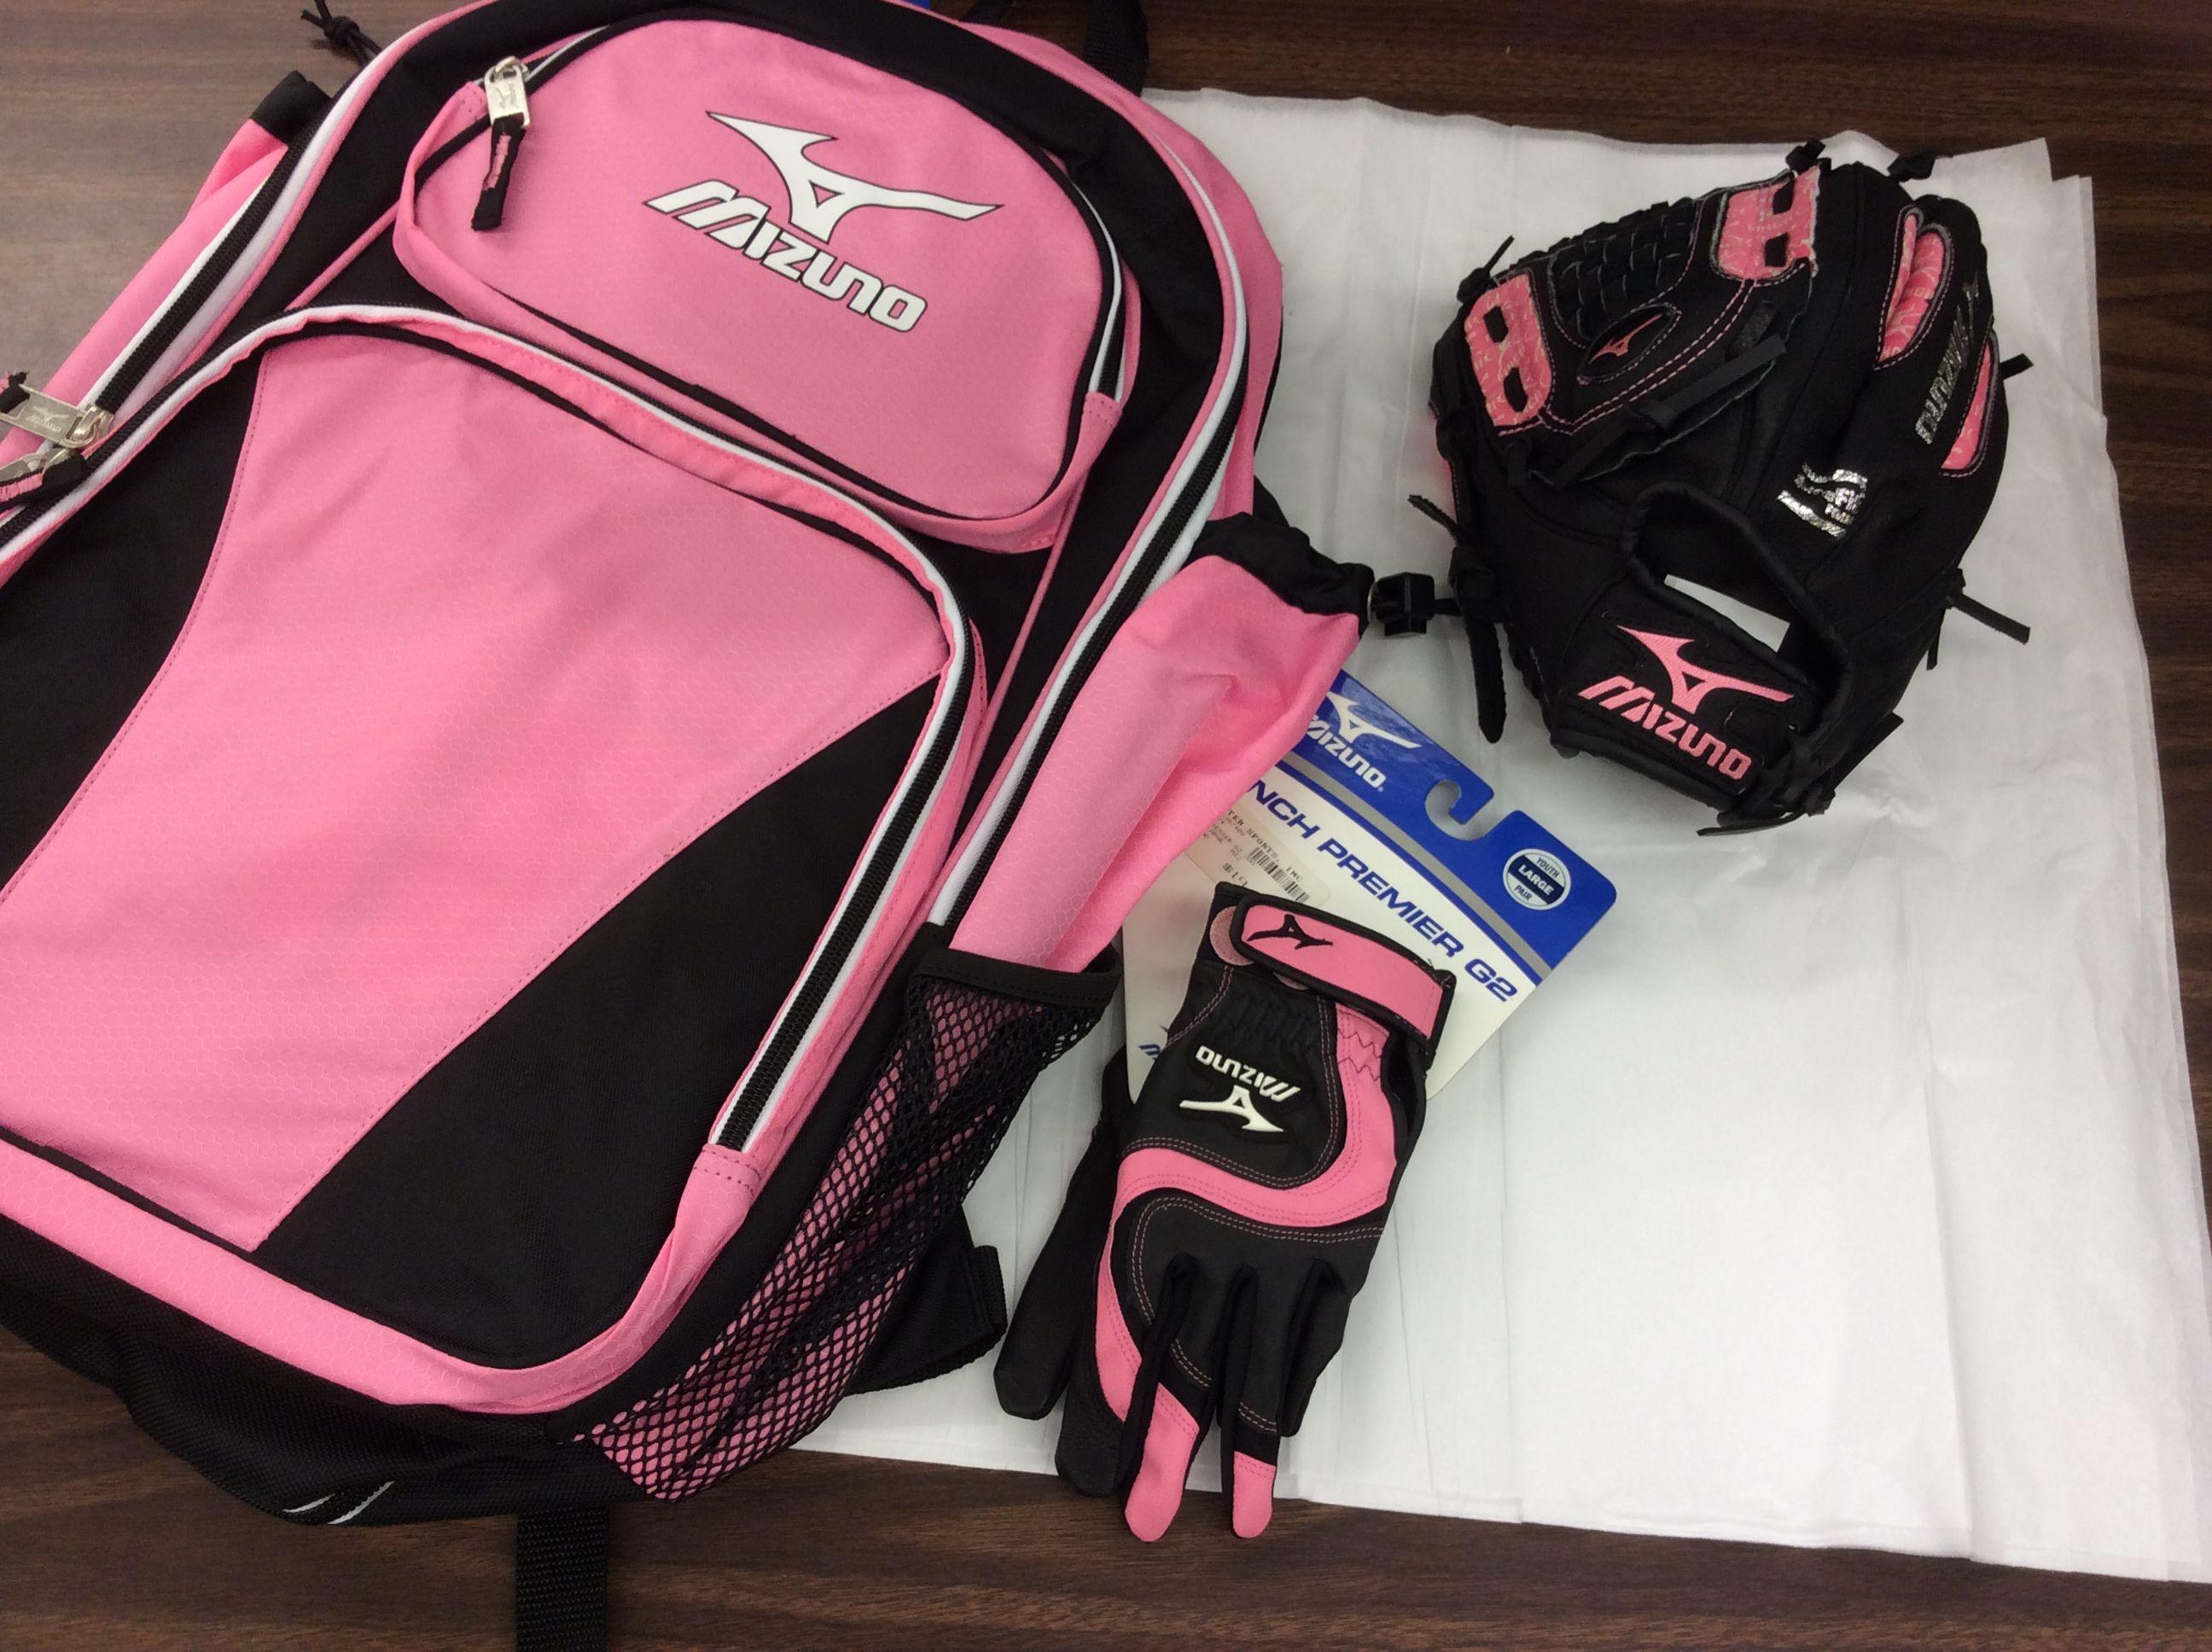 Mizuno Softball Gear S Pink Bag